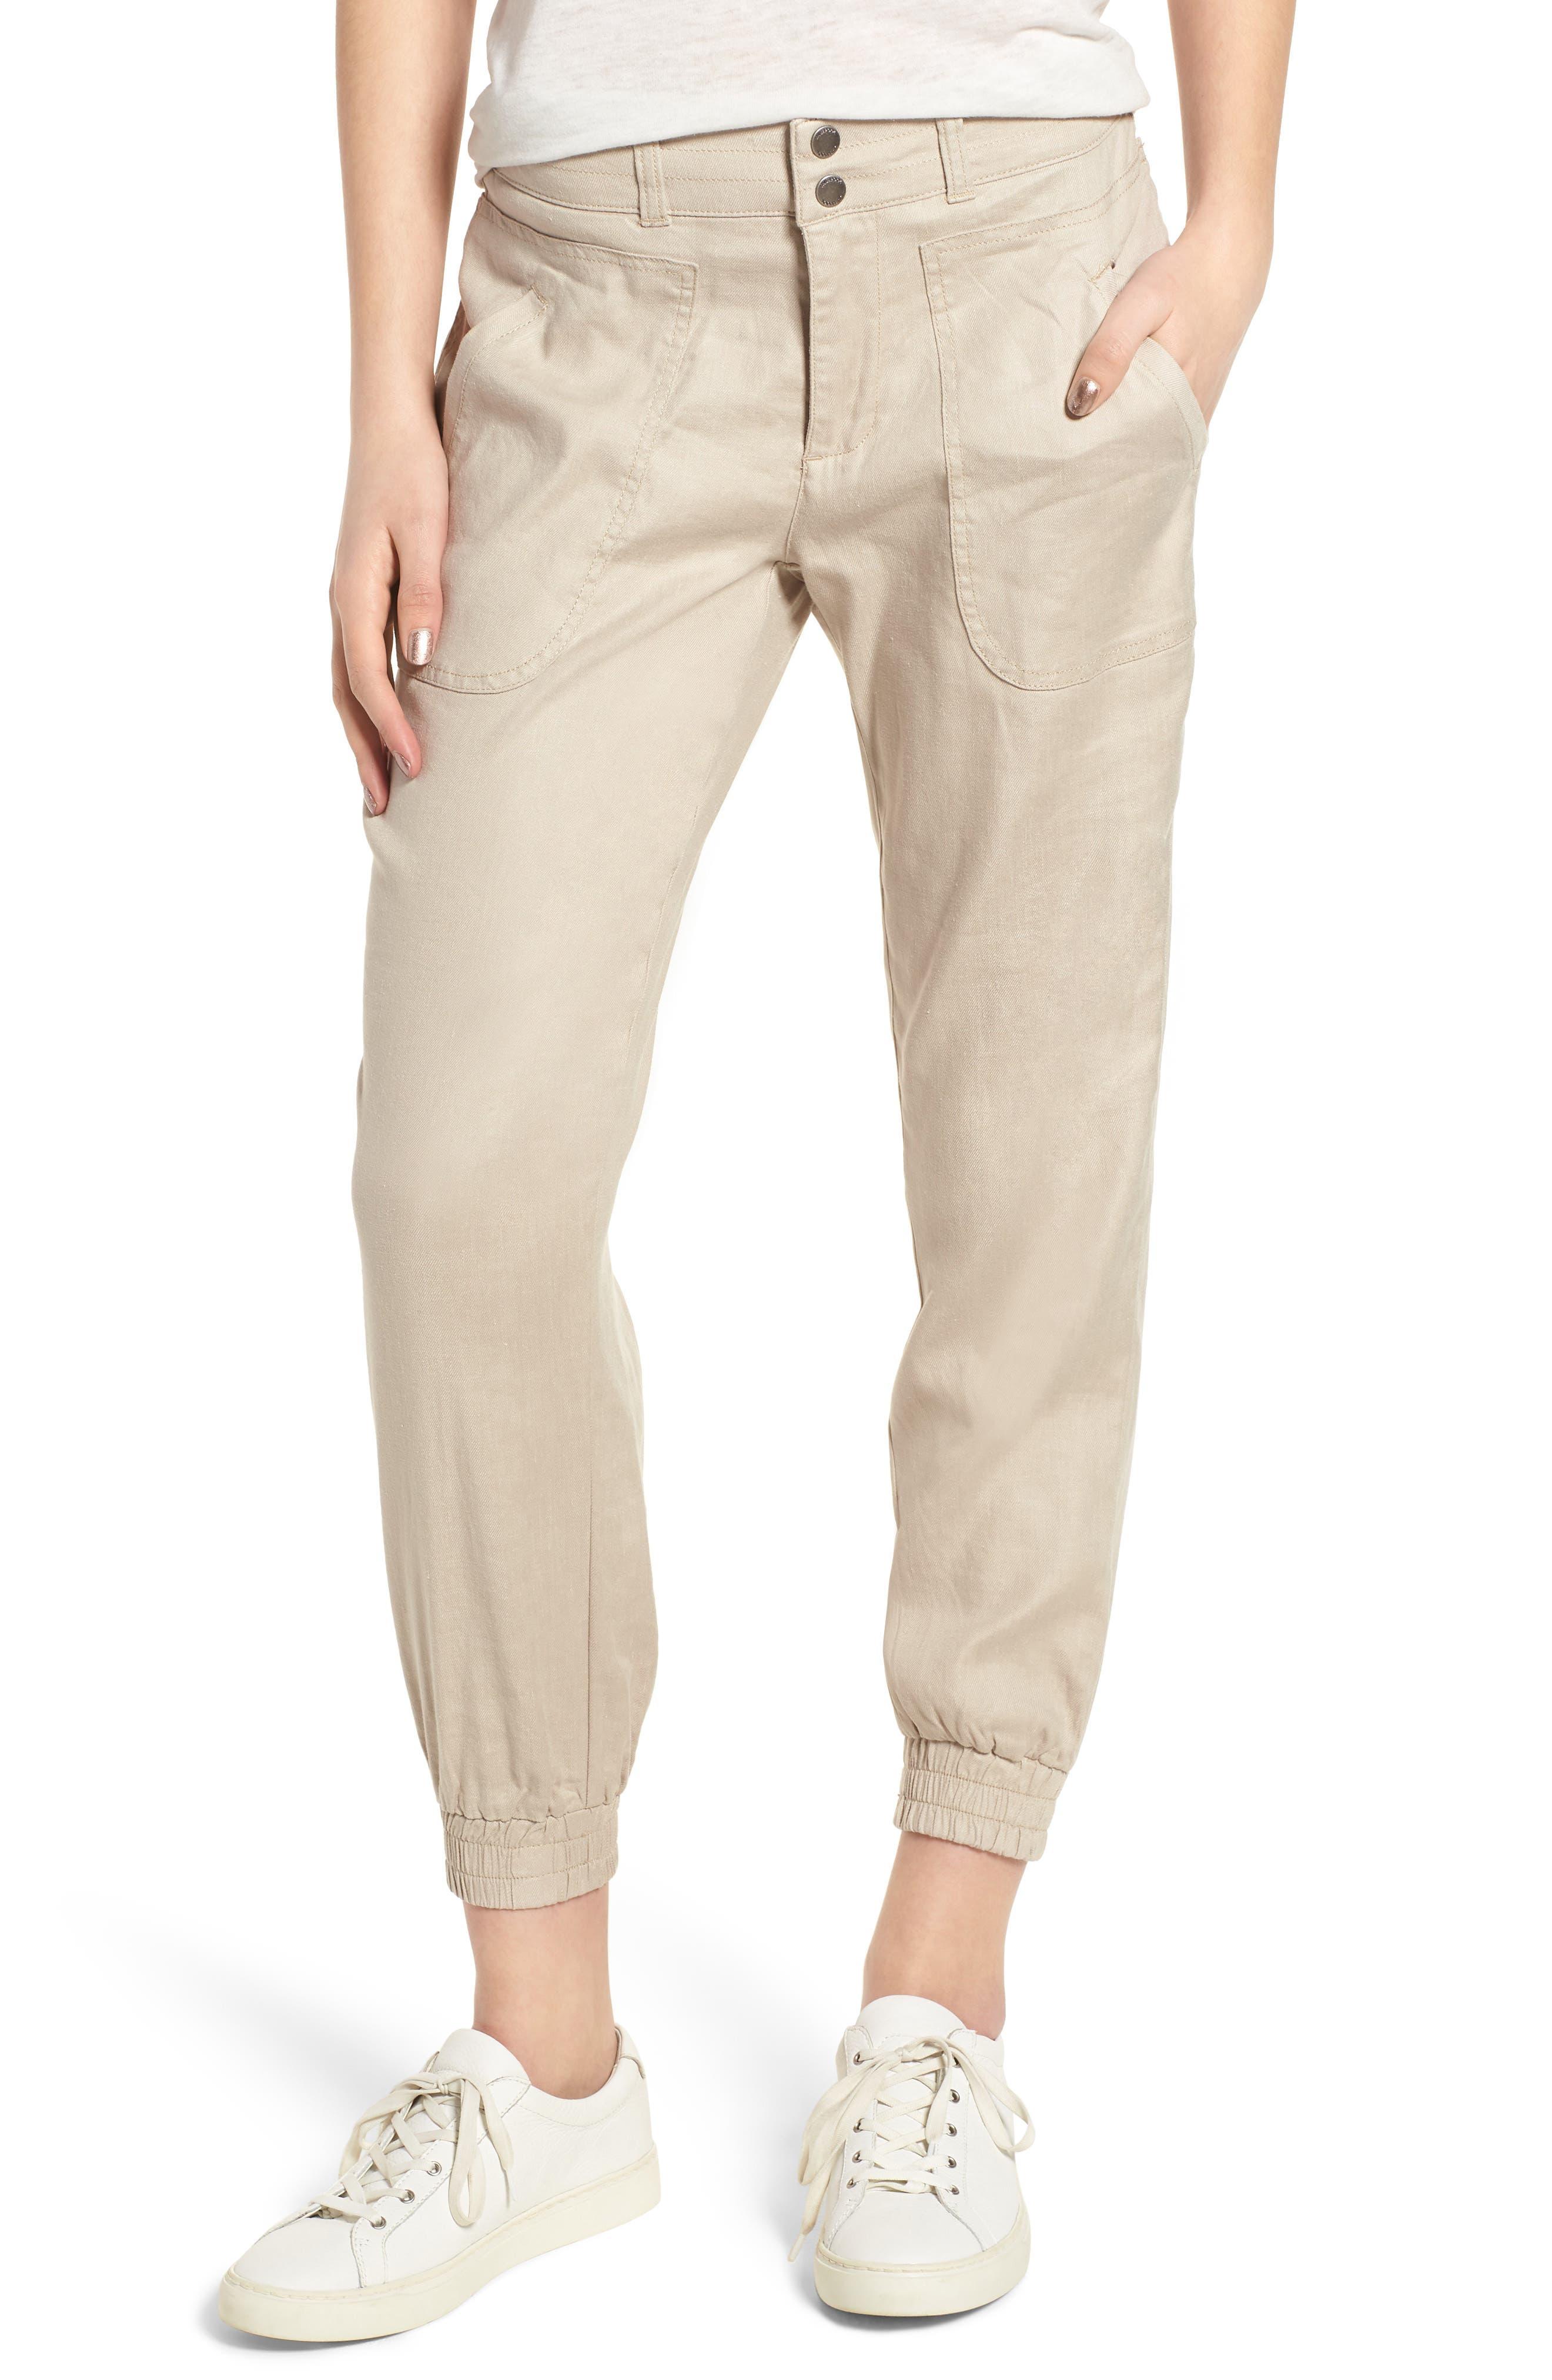 Liverpool Jeans Company Ava Linen Blend Jogger Pants